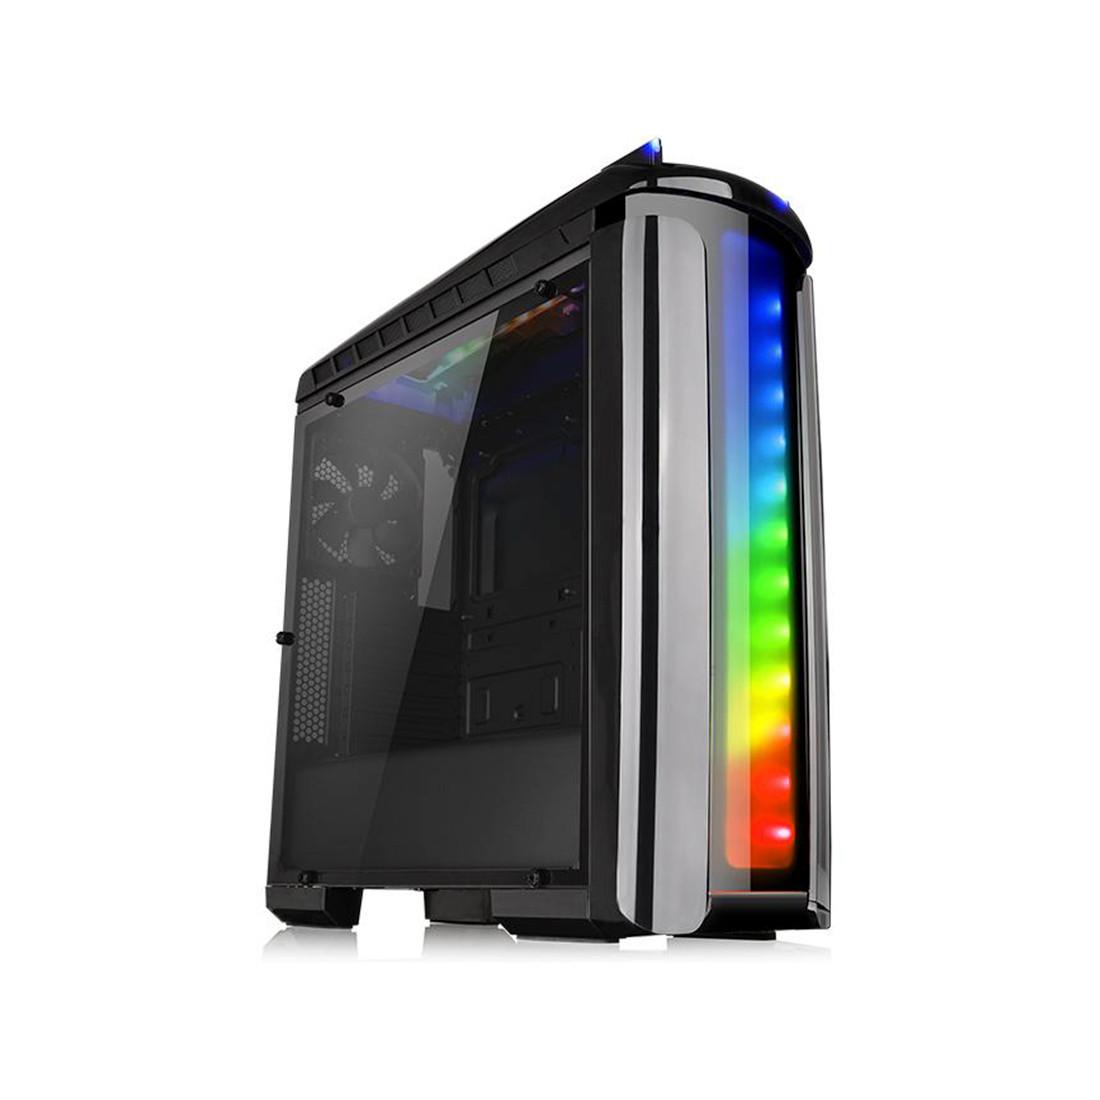 Компьютерный корпус Thermaltake Versa C22 RGB Black CA-1G9-00M1WN-00 (Без Б/П)